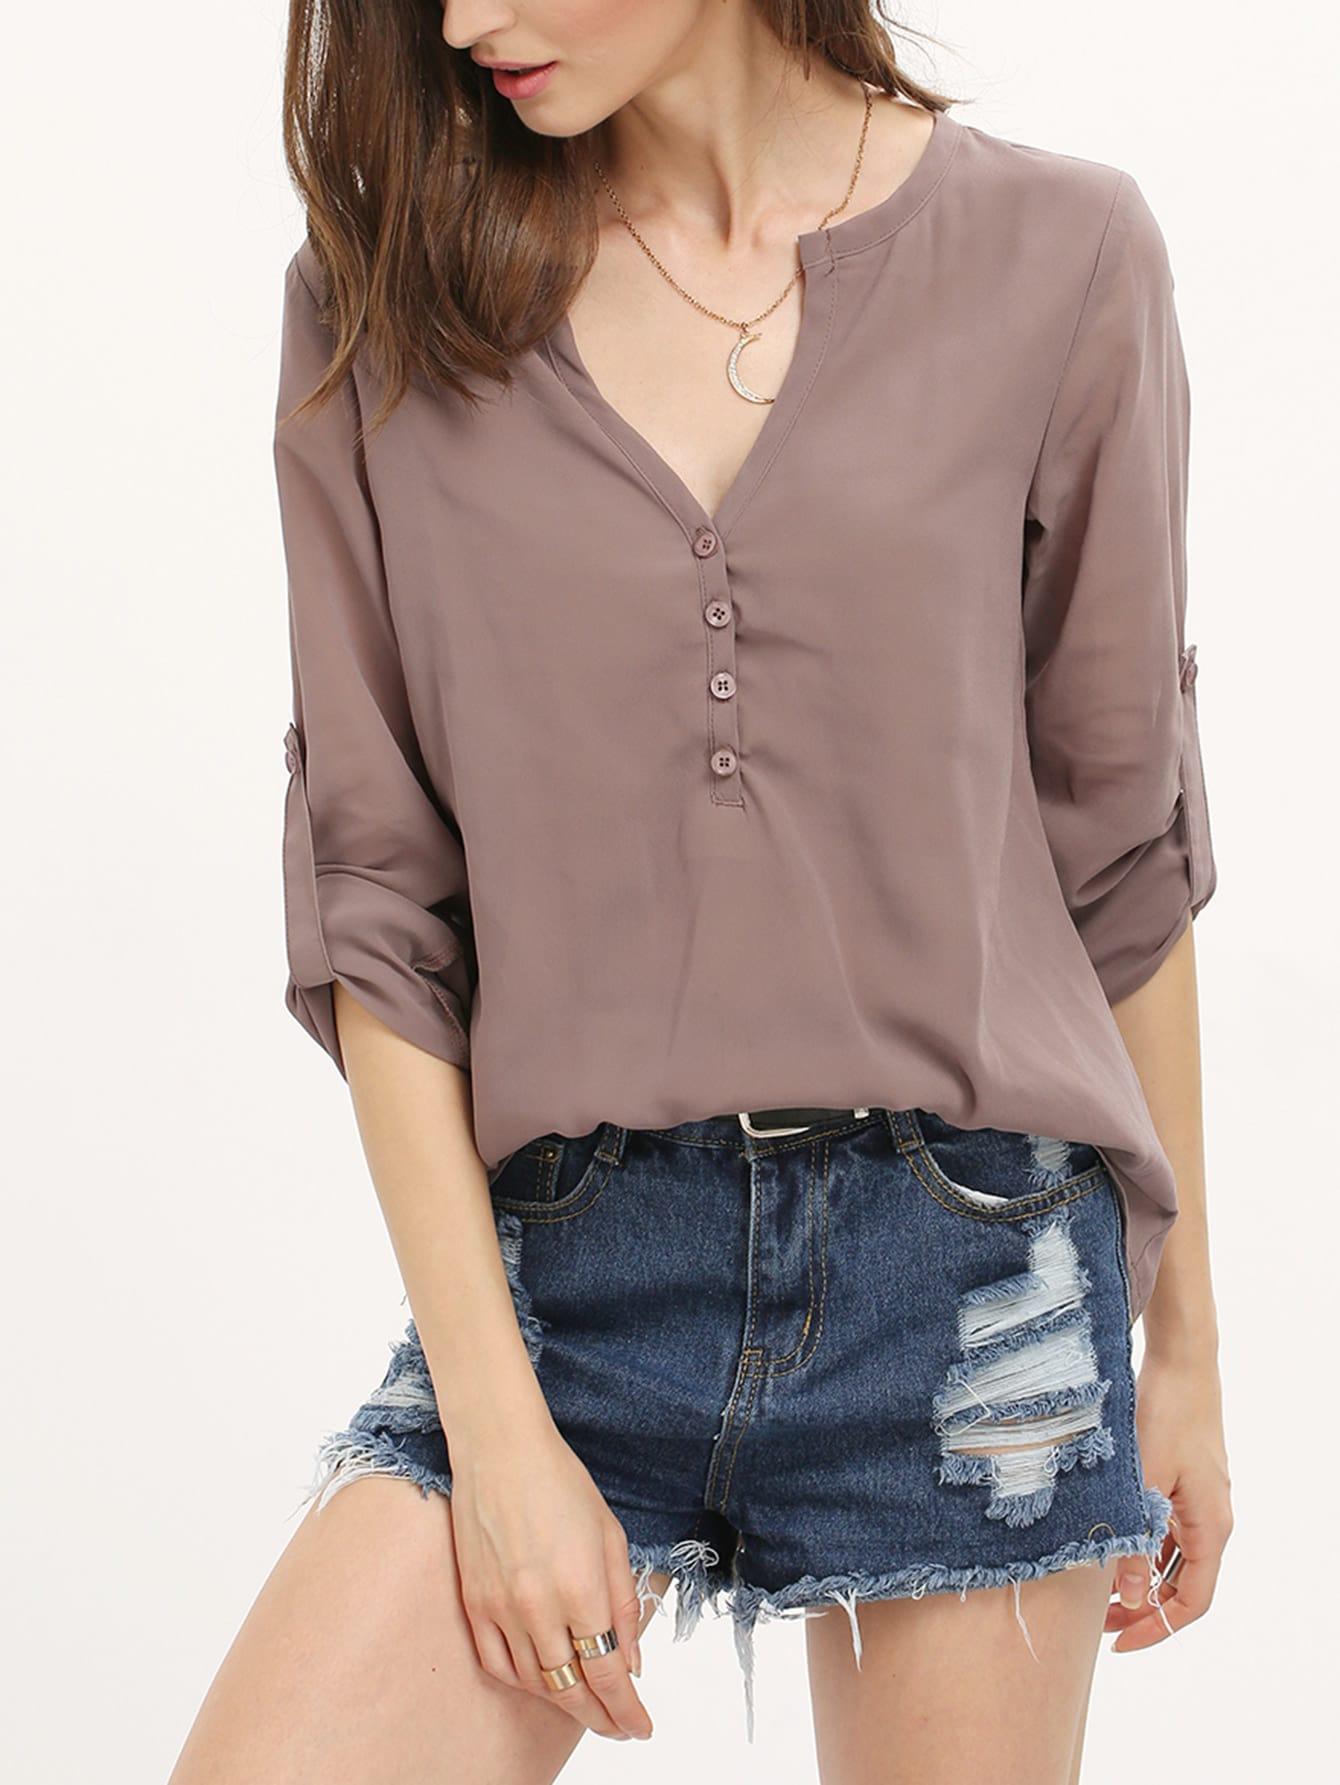 Popular Womens Plain Turndown Collar Lace Up Long Sleeve Chiffon Blouse Brown - PINK QUEEN